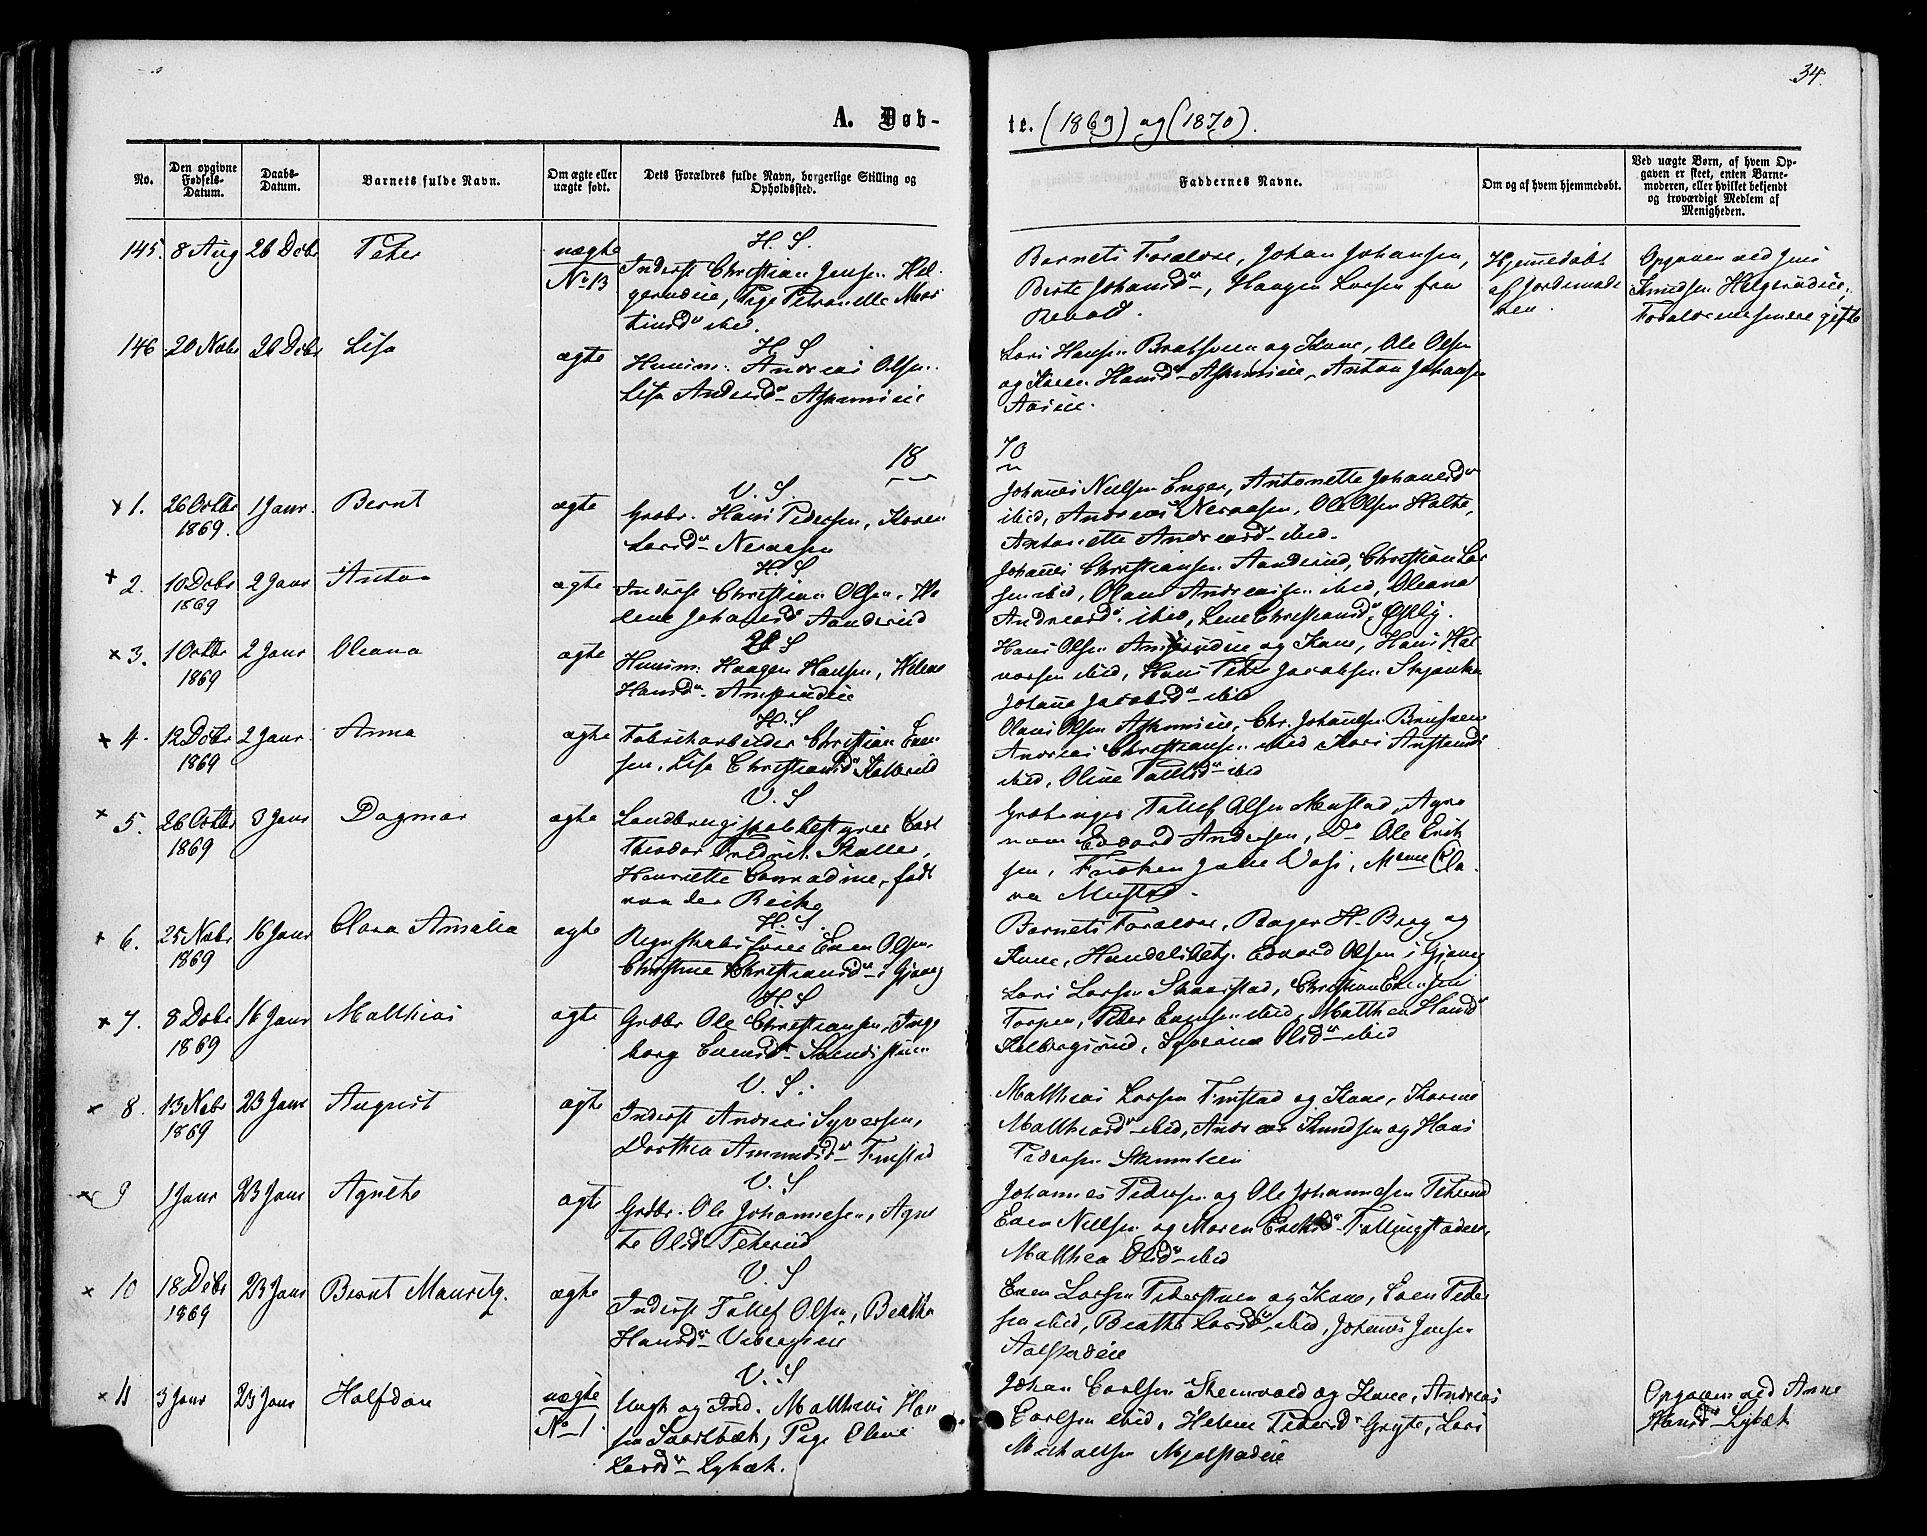 SAH, Vardal prestekontor, H/Ha/Haa/L0007: Ministerialbok nr. 7, 1867-1878, s. 34